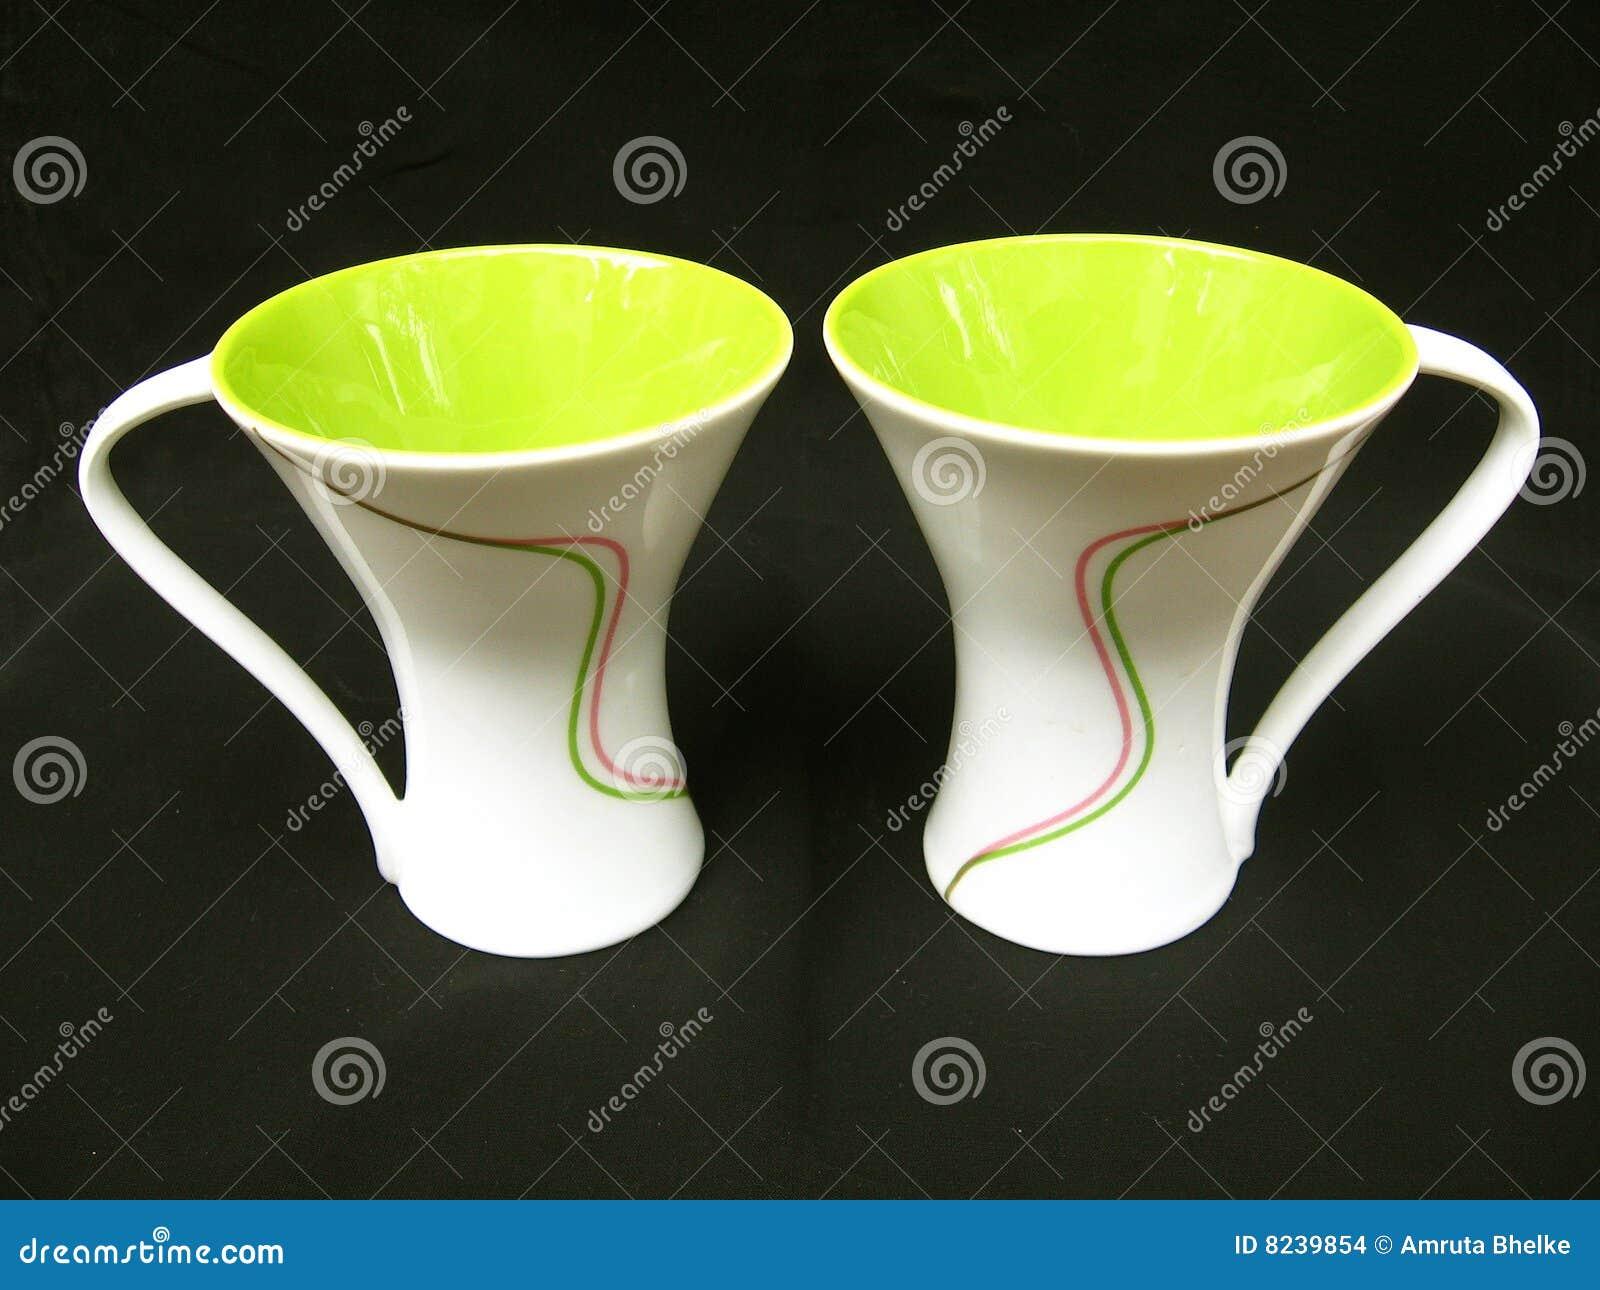 Designer Coffee Mugs Stock Images Image 8239854